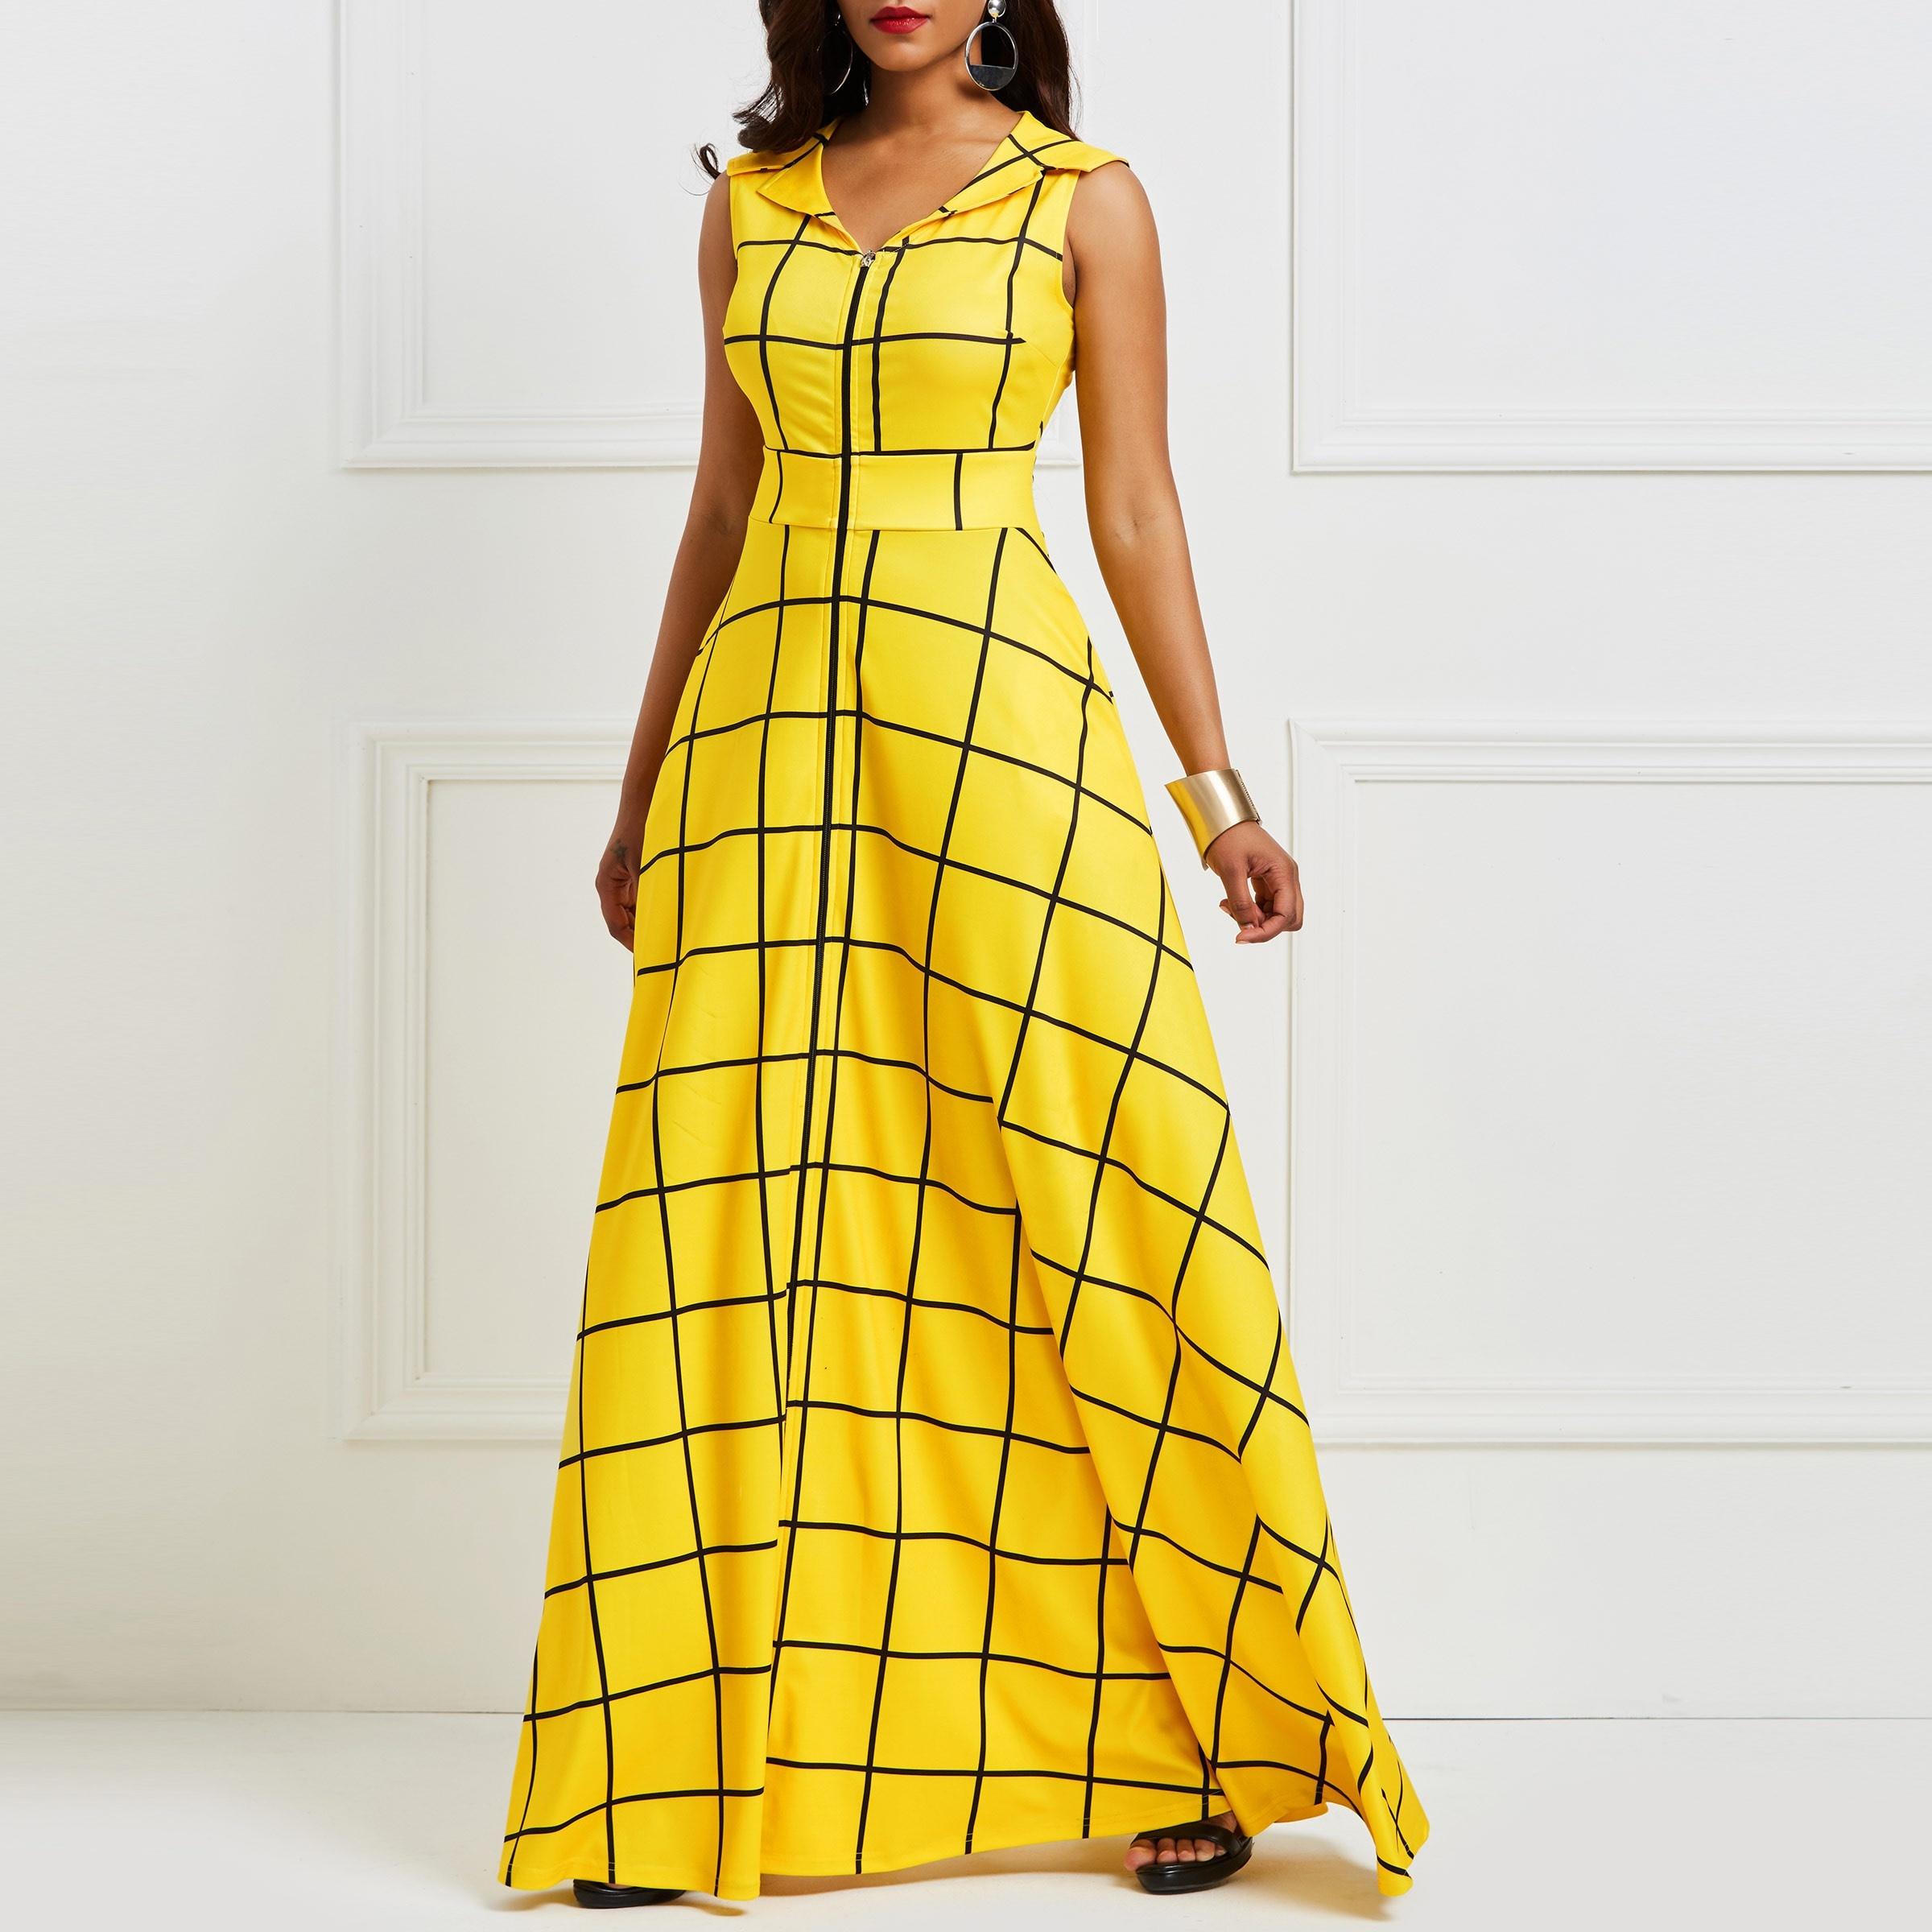 bd3b32b41f Buy yellow dress elegant and get free shipping on AliExpress.com